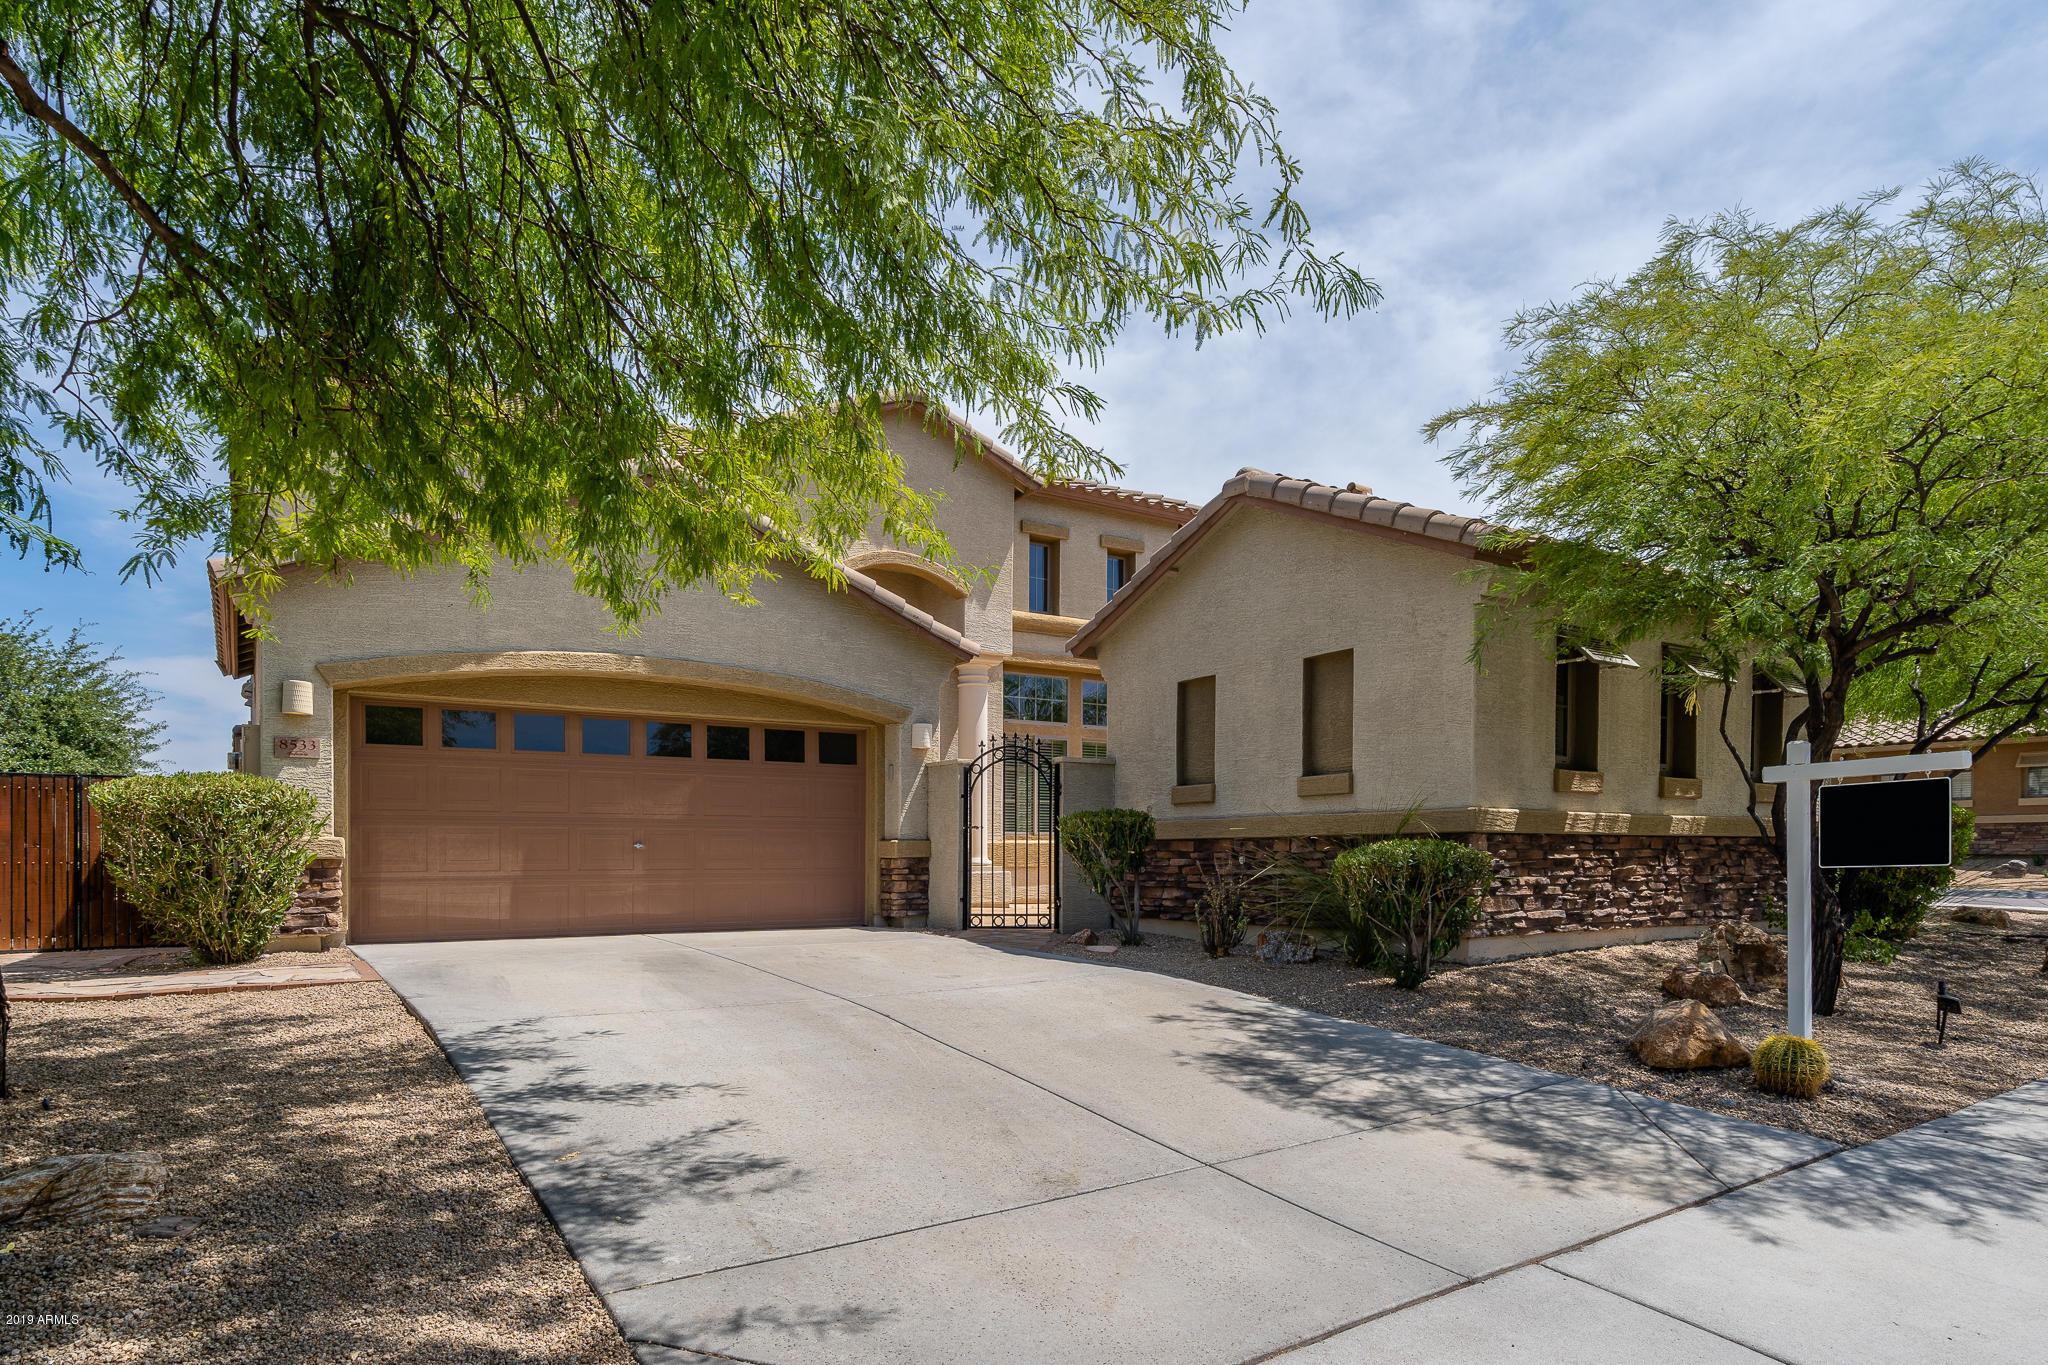 8533 W DESERT ELM Lane, Peoria in Maricopa County, AZ 85383 Home for Sale